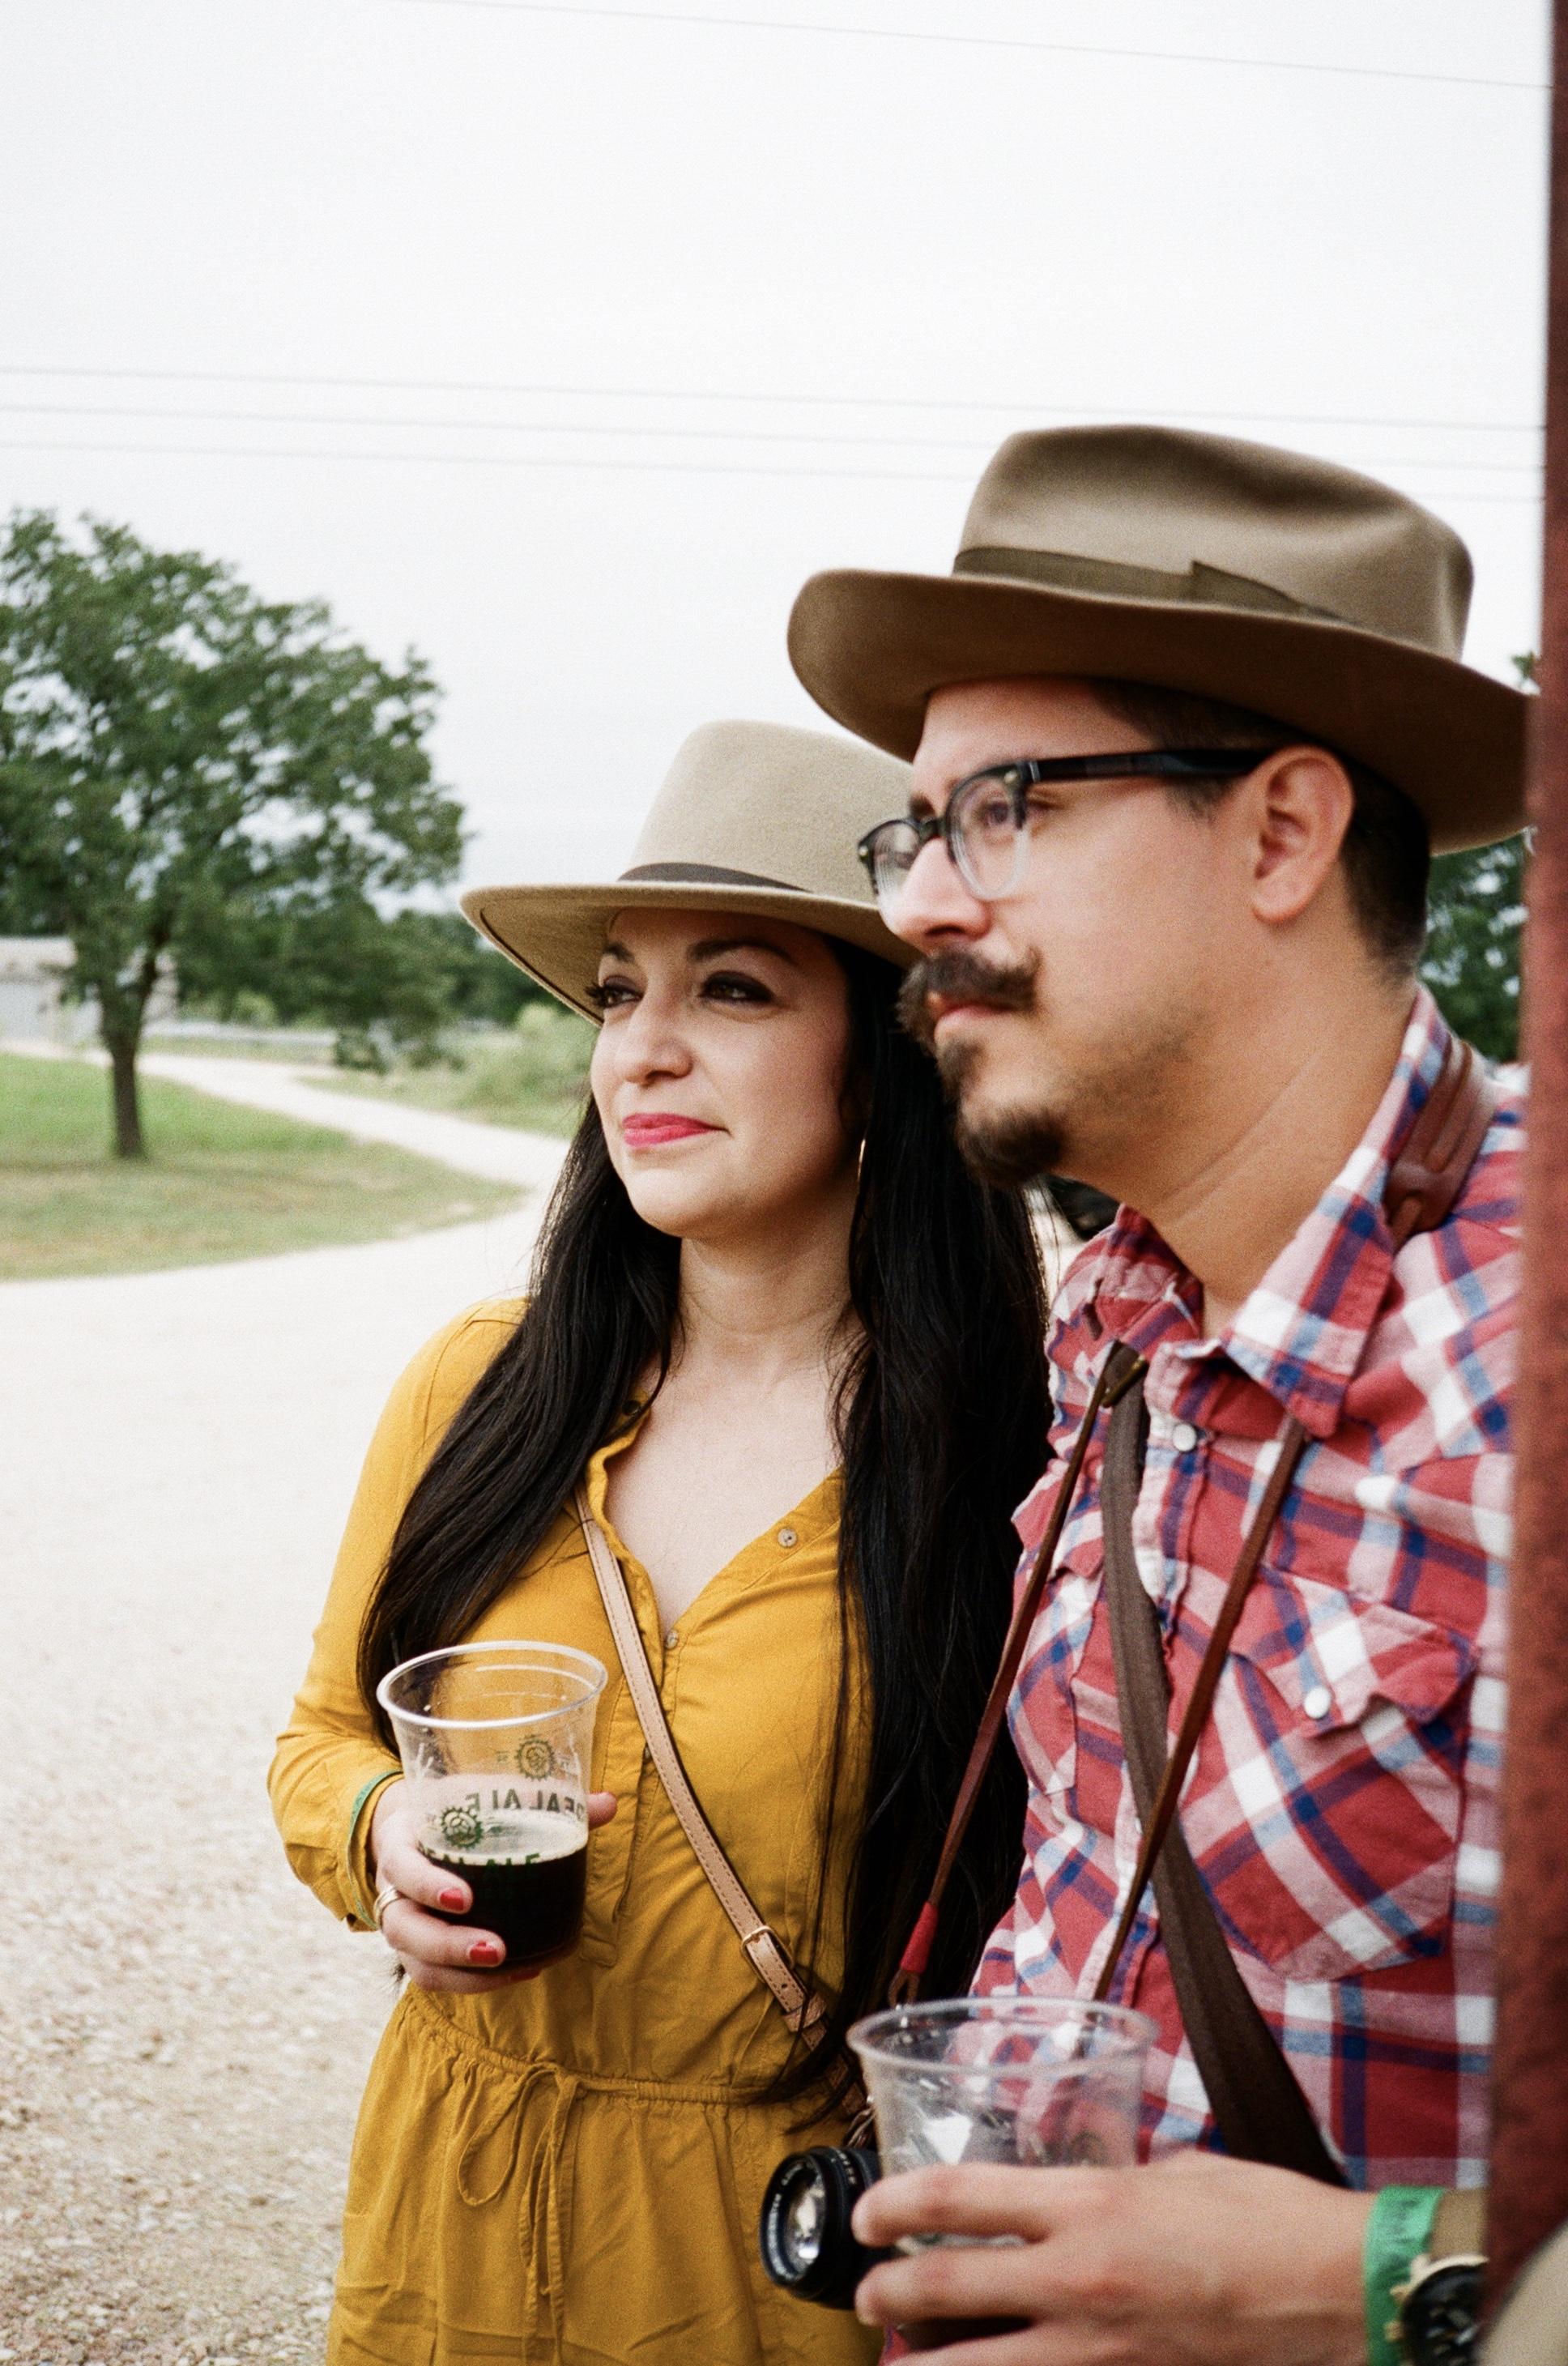 JoMando and Lynn, Real Ale Oktoberfest 2018  Ricoh 35 EFS | Fujifilm Superia 400  by Harrison Civick